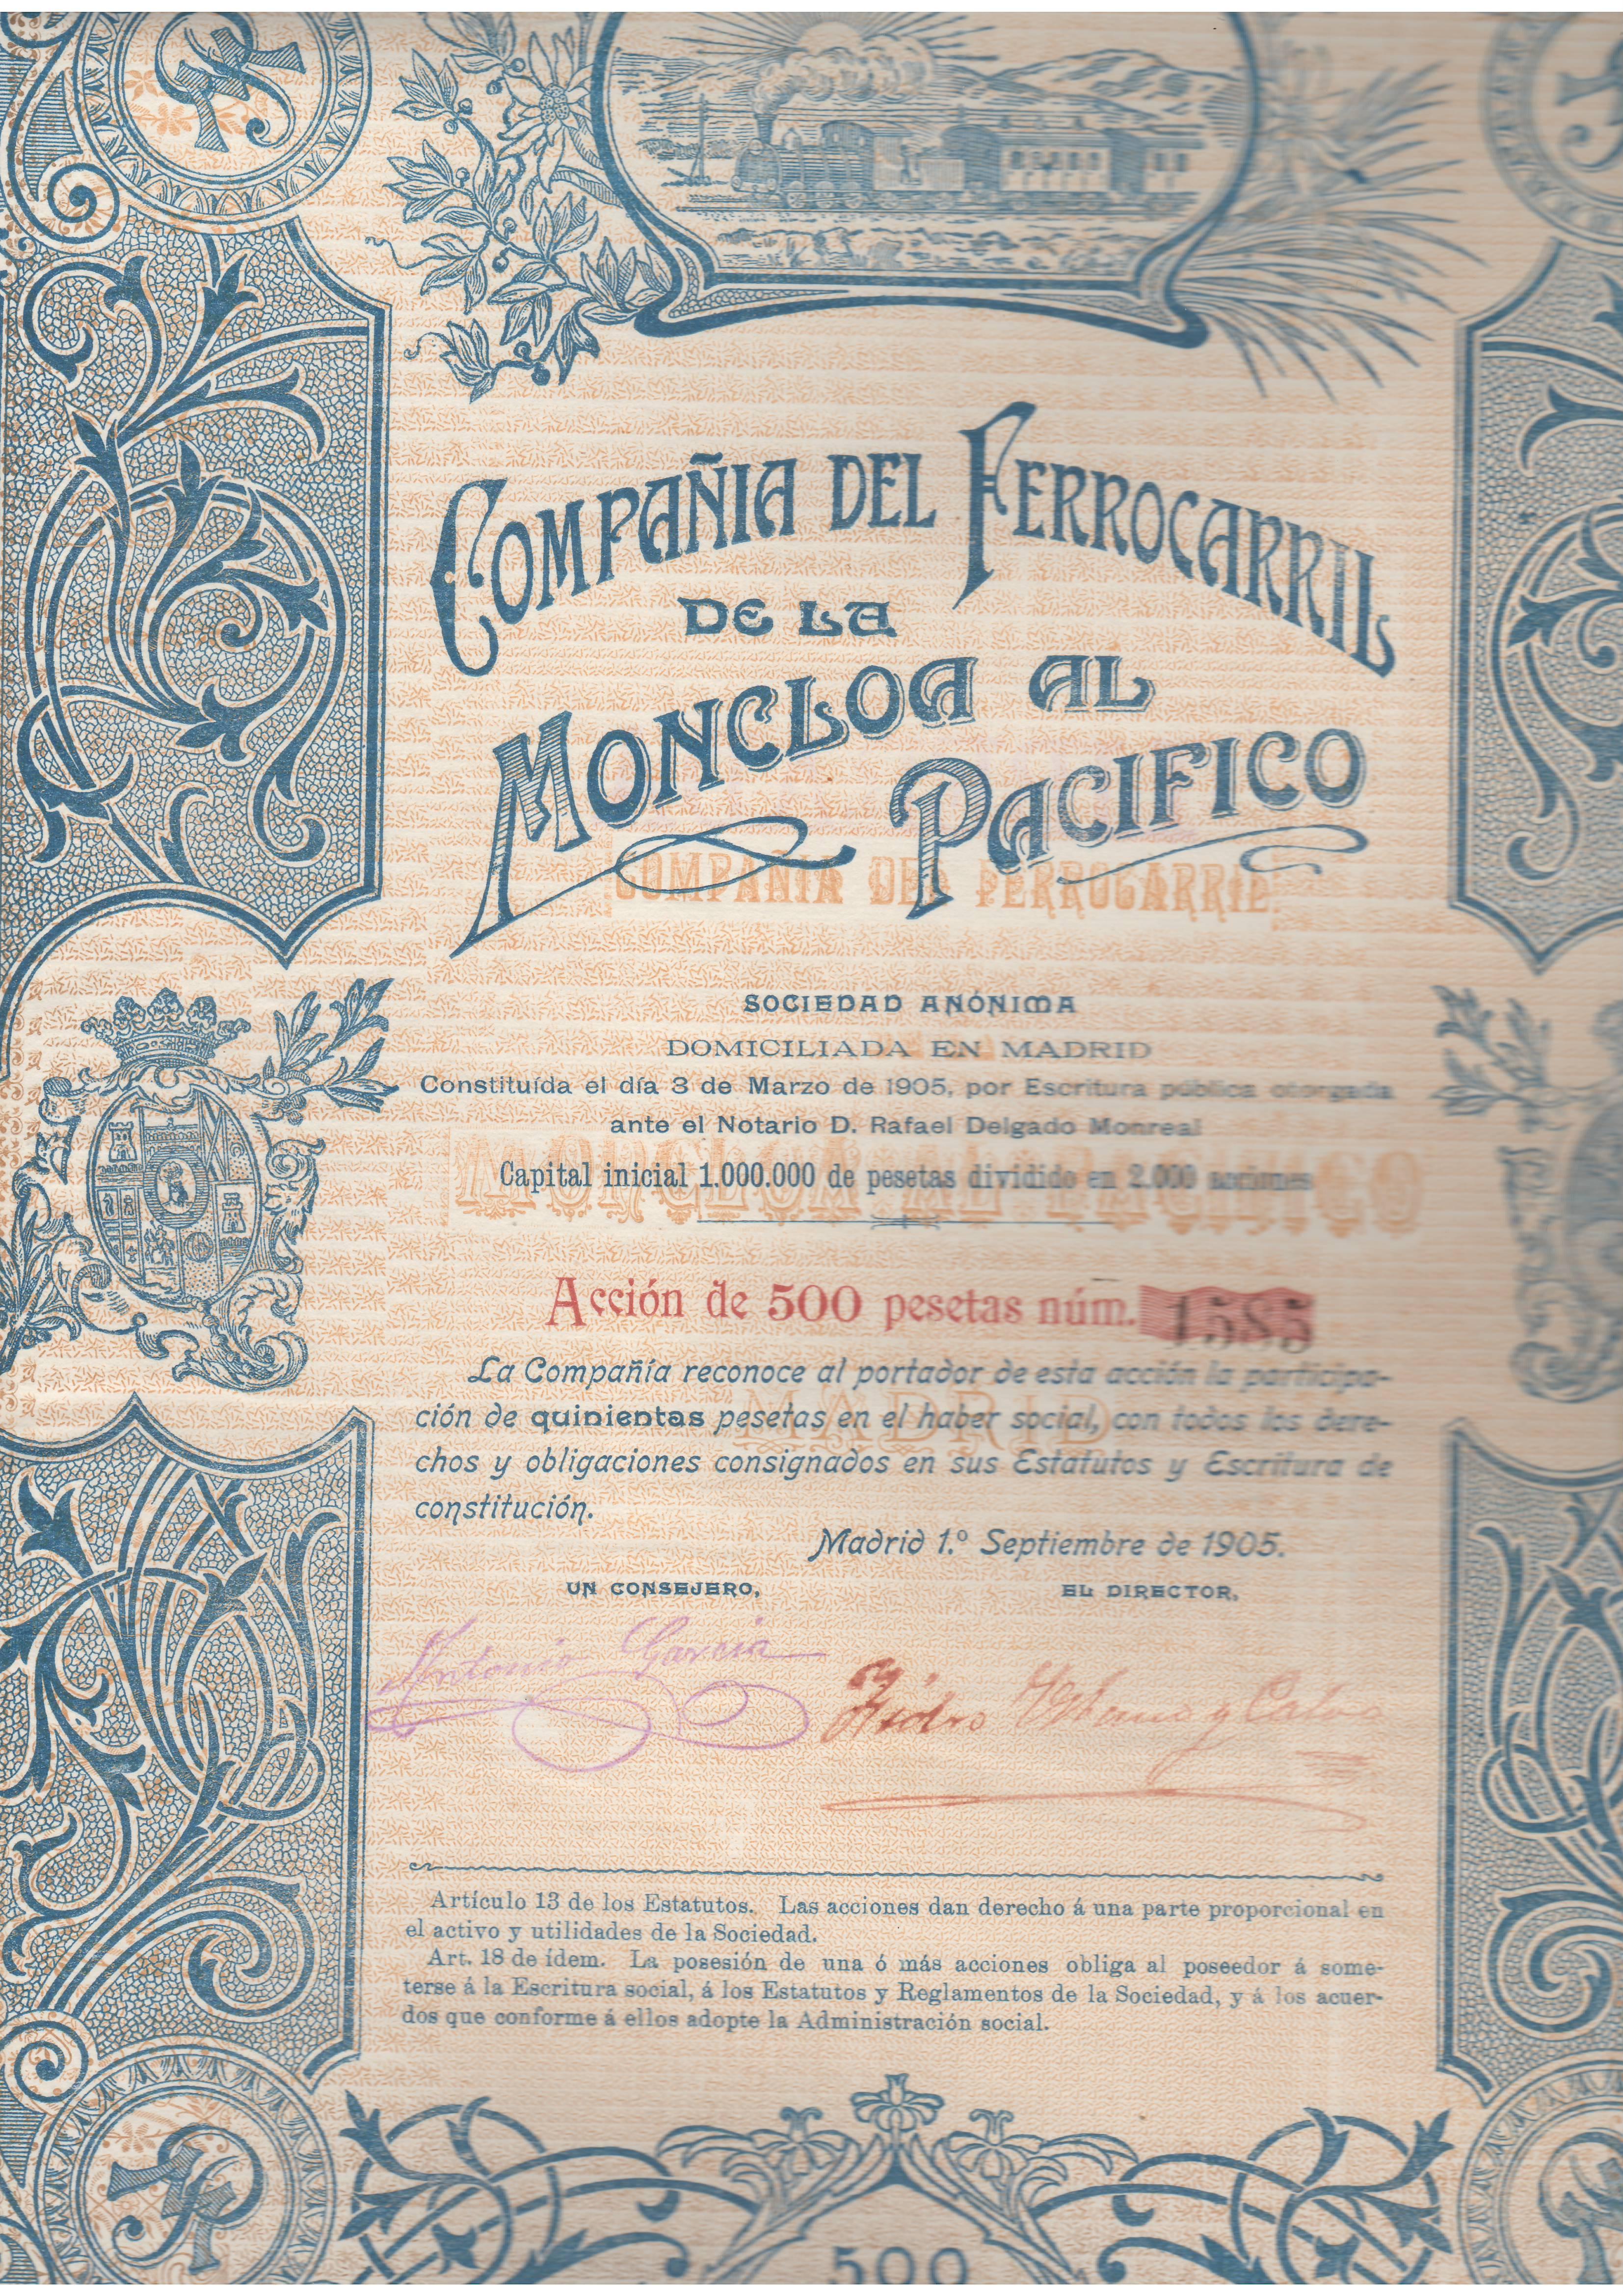 Compañía del Ferrocarril de la Moncloa al Pacífico.